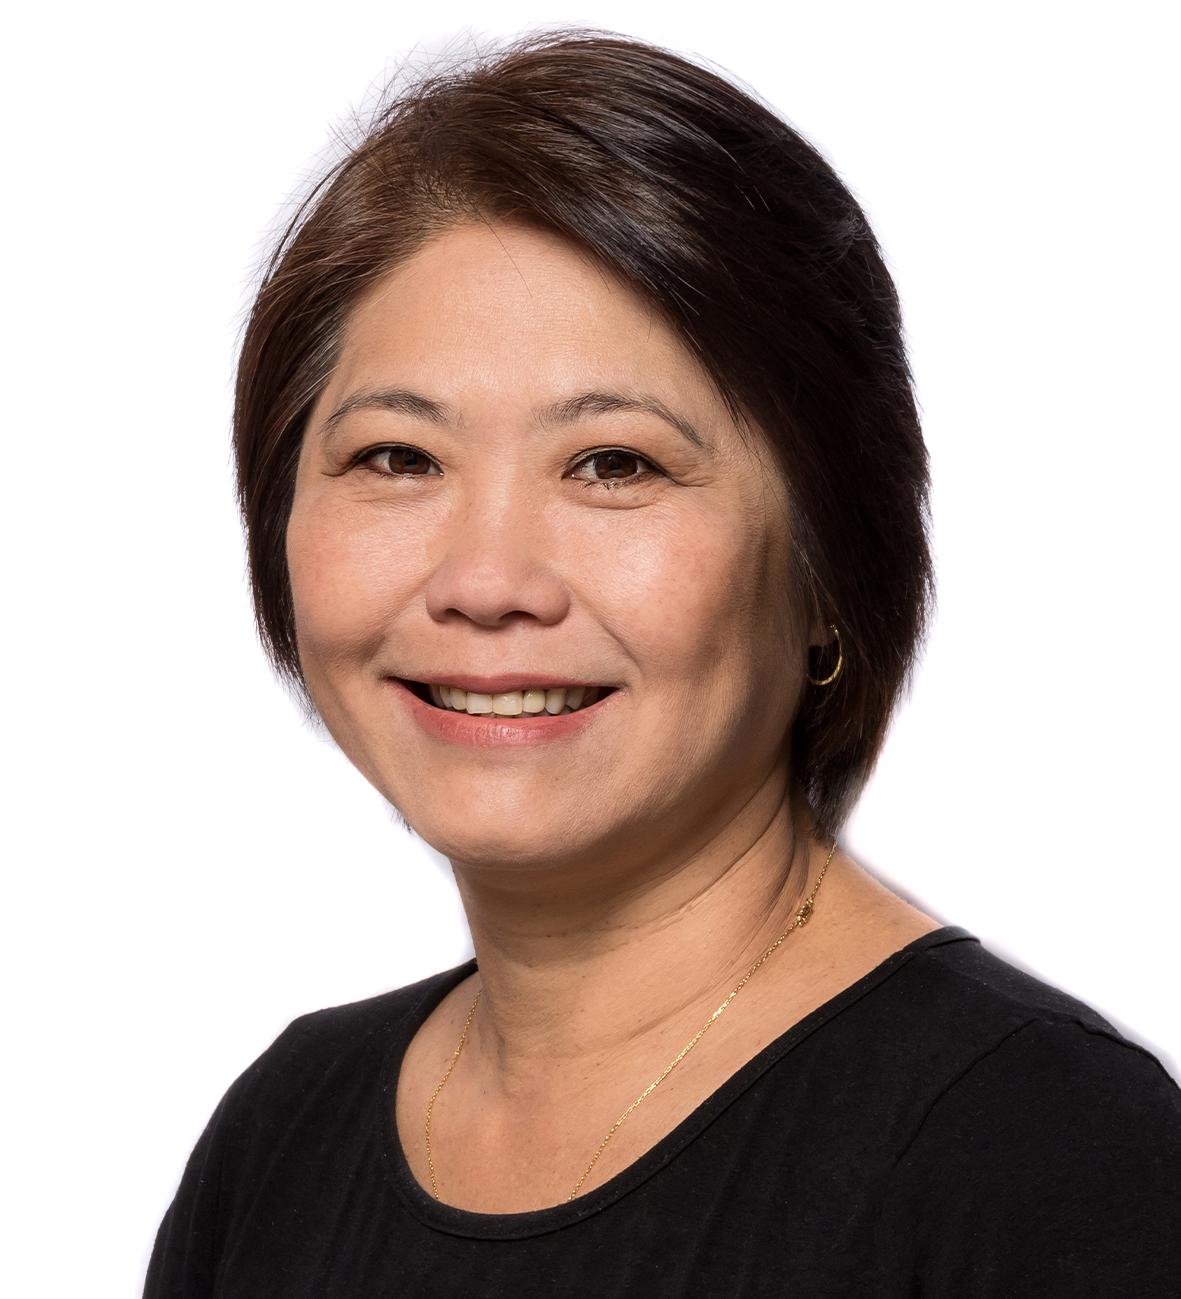 Dra. Rosely Harue Katuiama